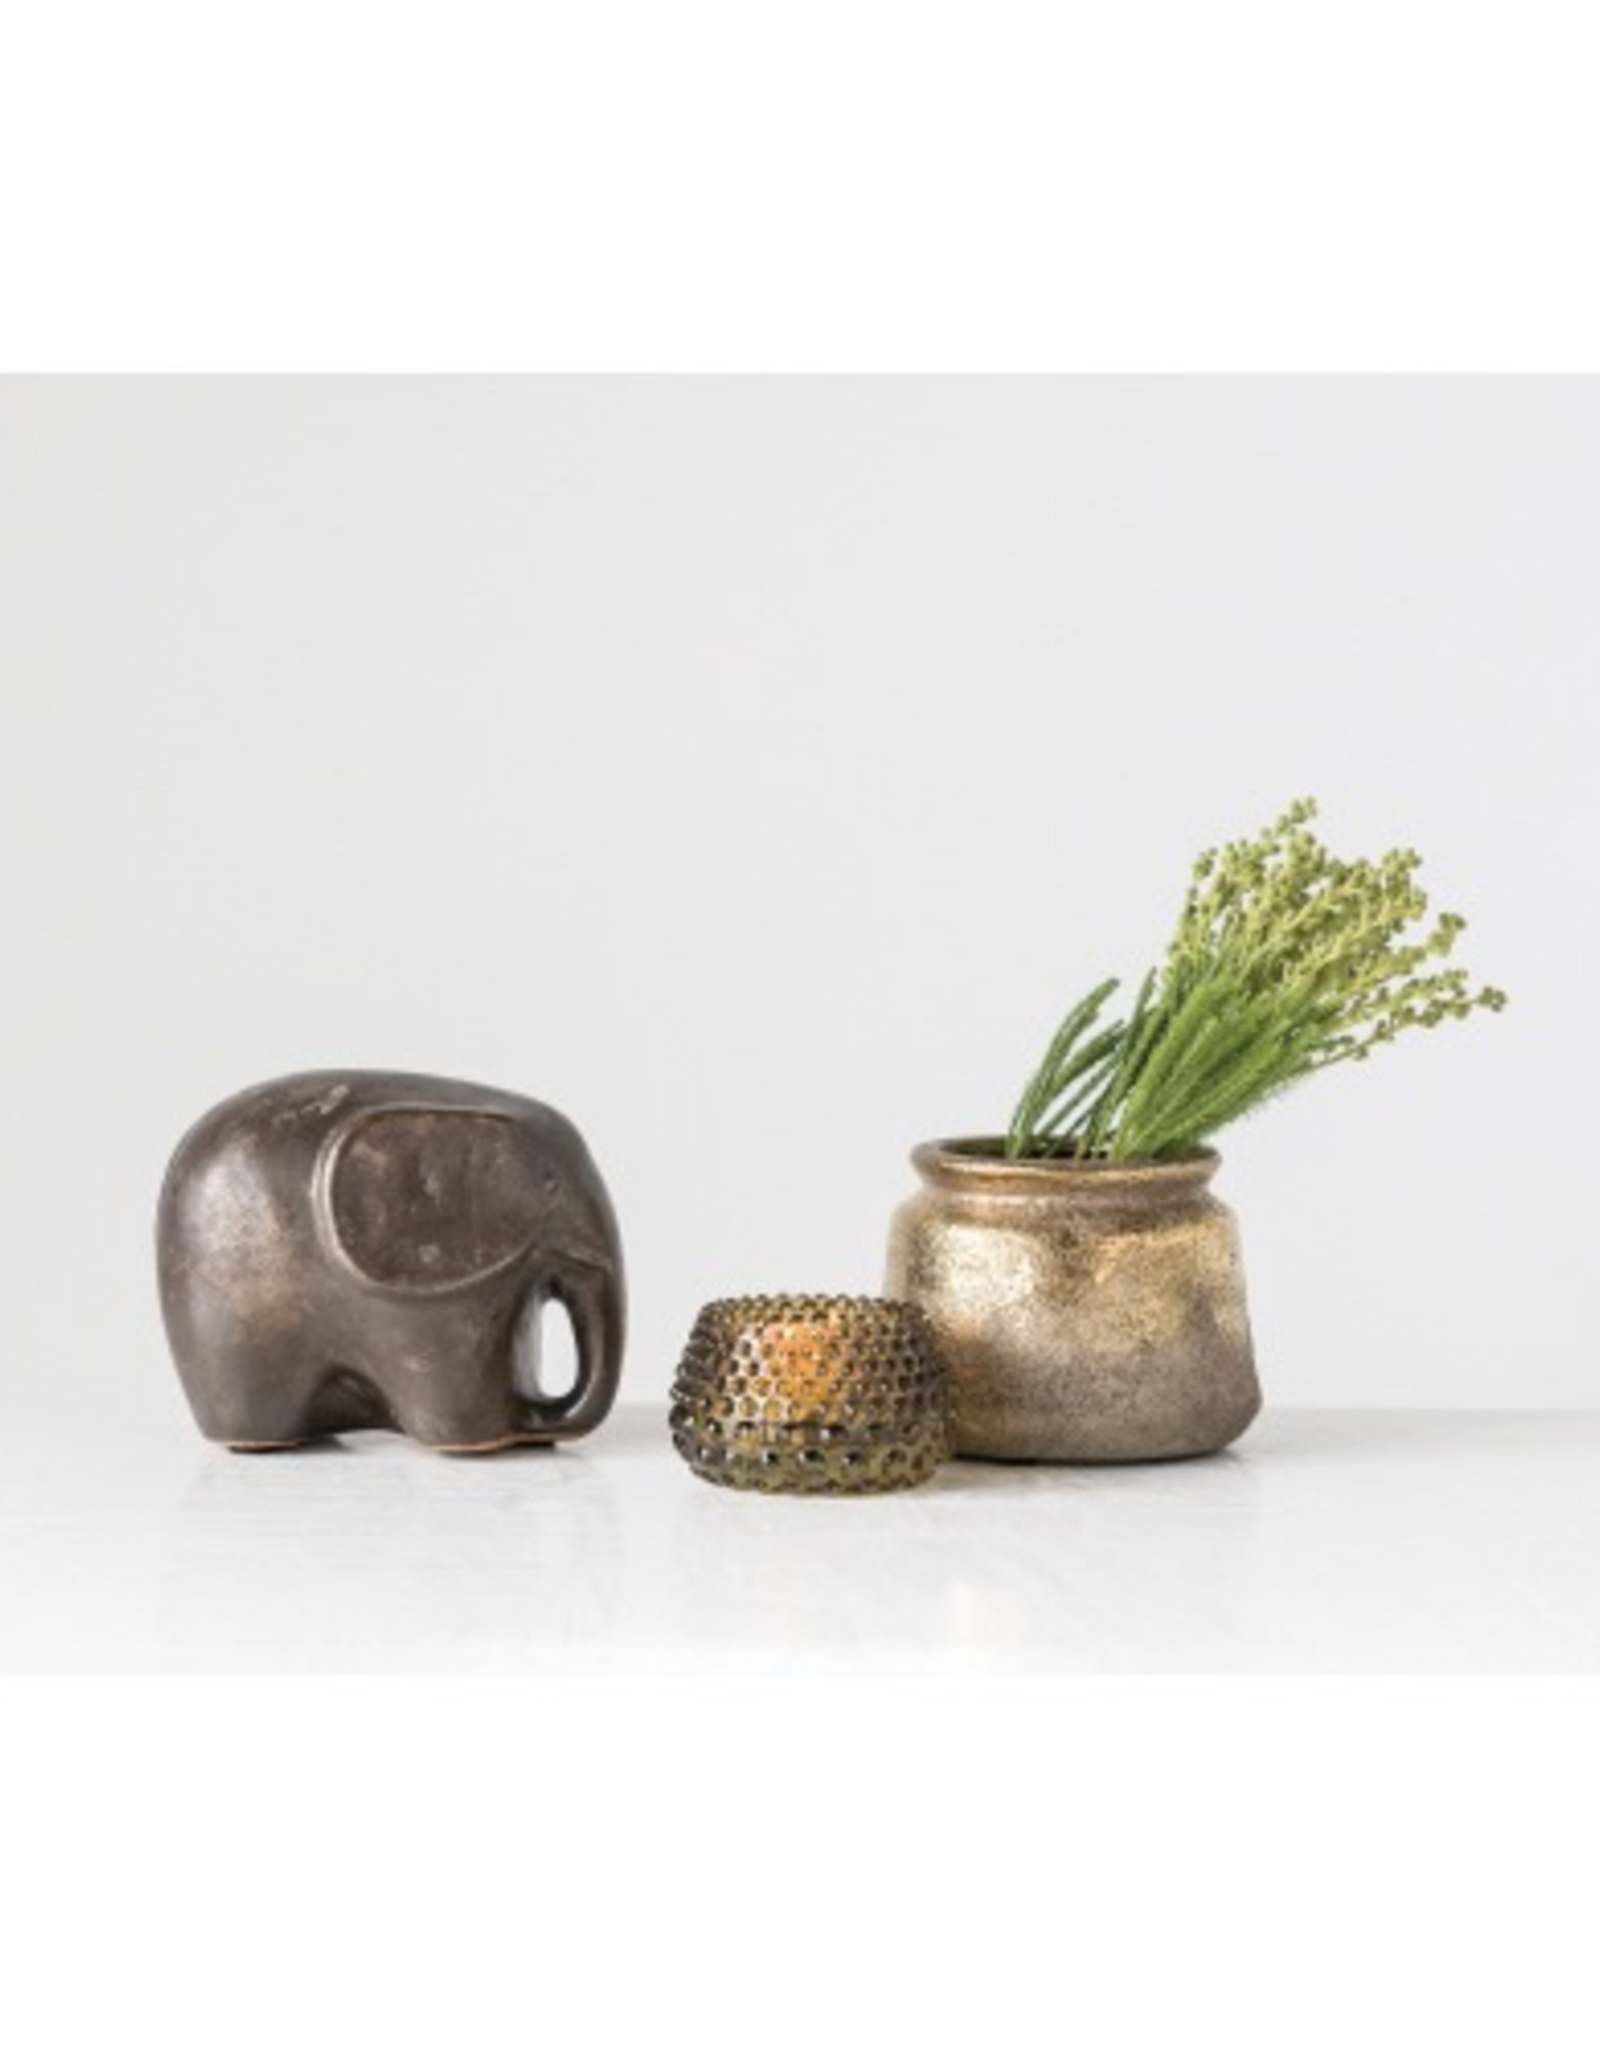 Elephant, Terra-cotta, Reactive Glaze, Metallic